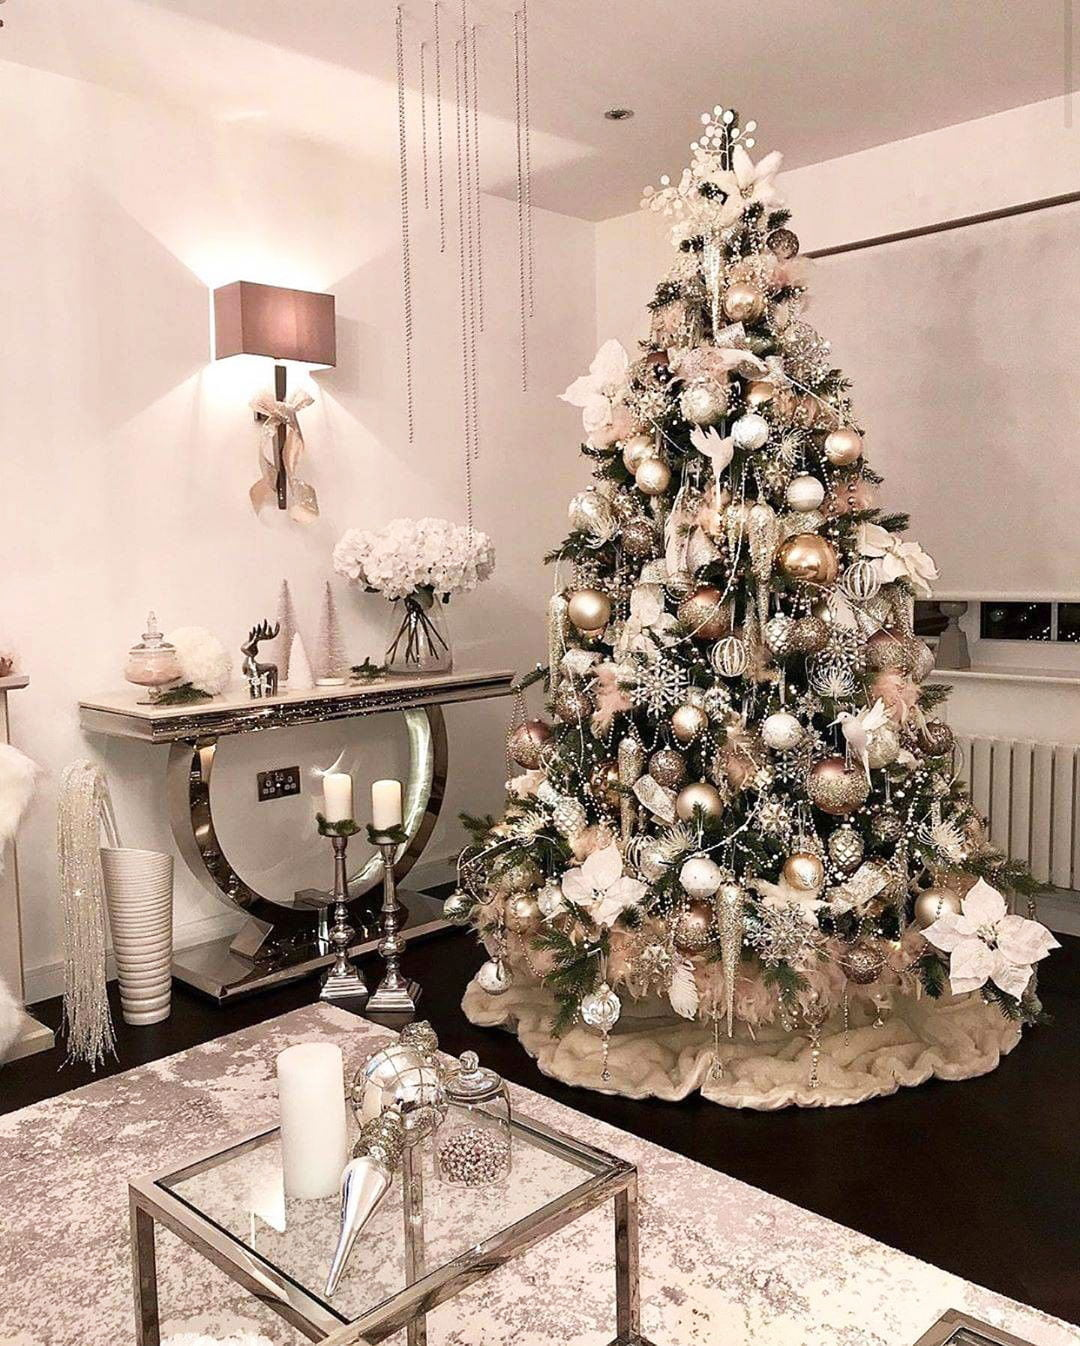 49 Simple Christmas Tree Decorating Ideas 8